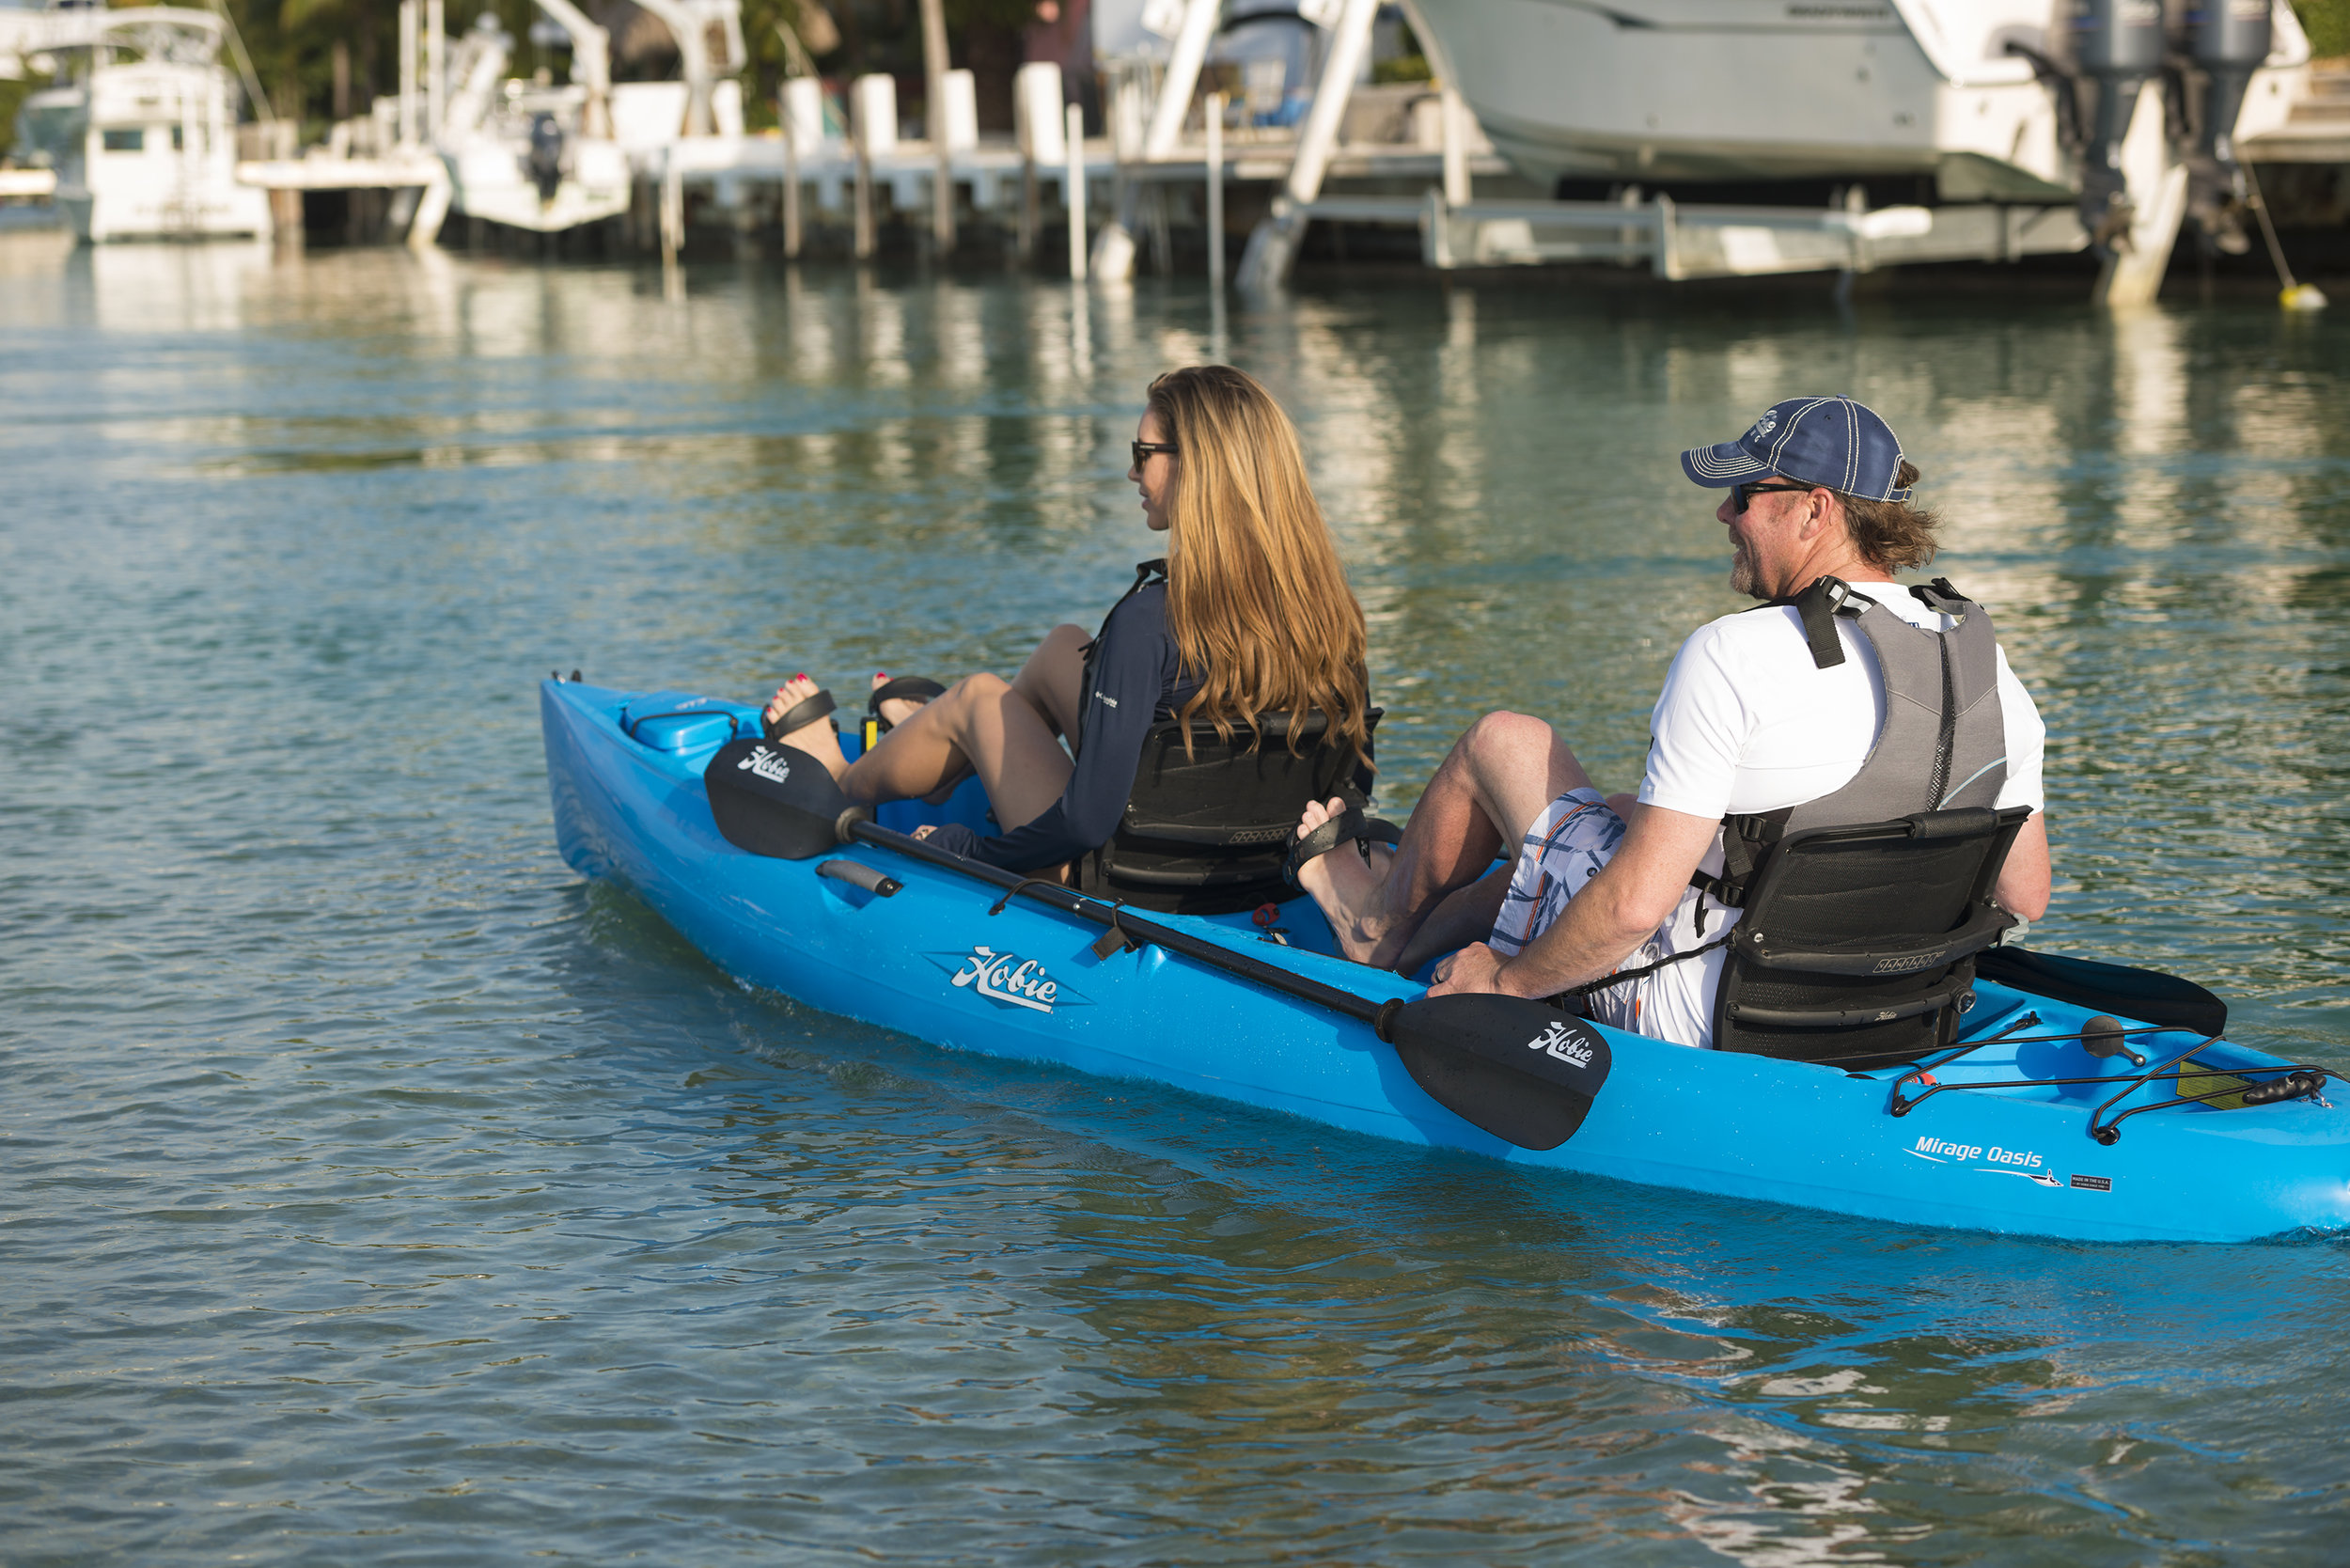 Oasis-action-blue-Florida-Root-Harbor-lg.jpg